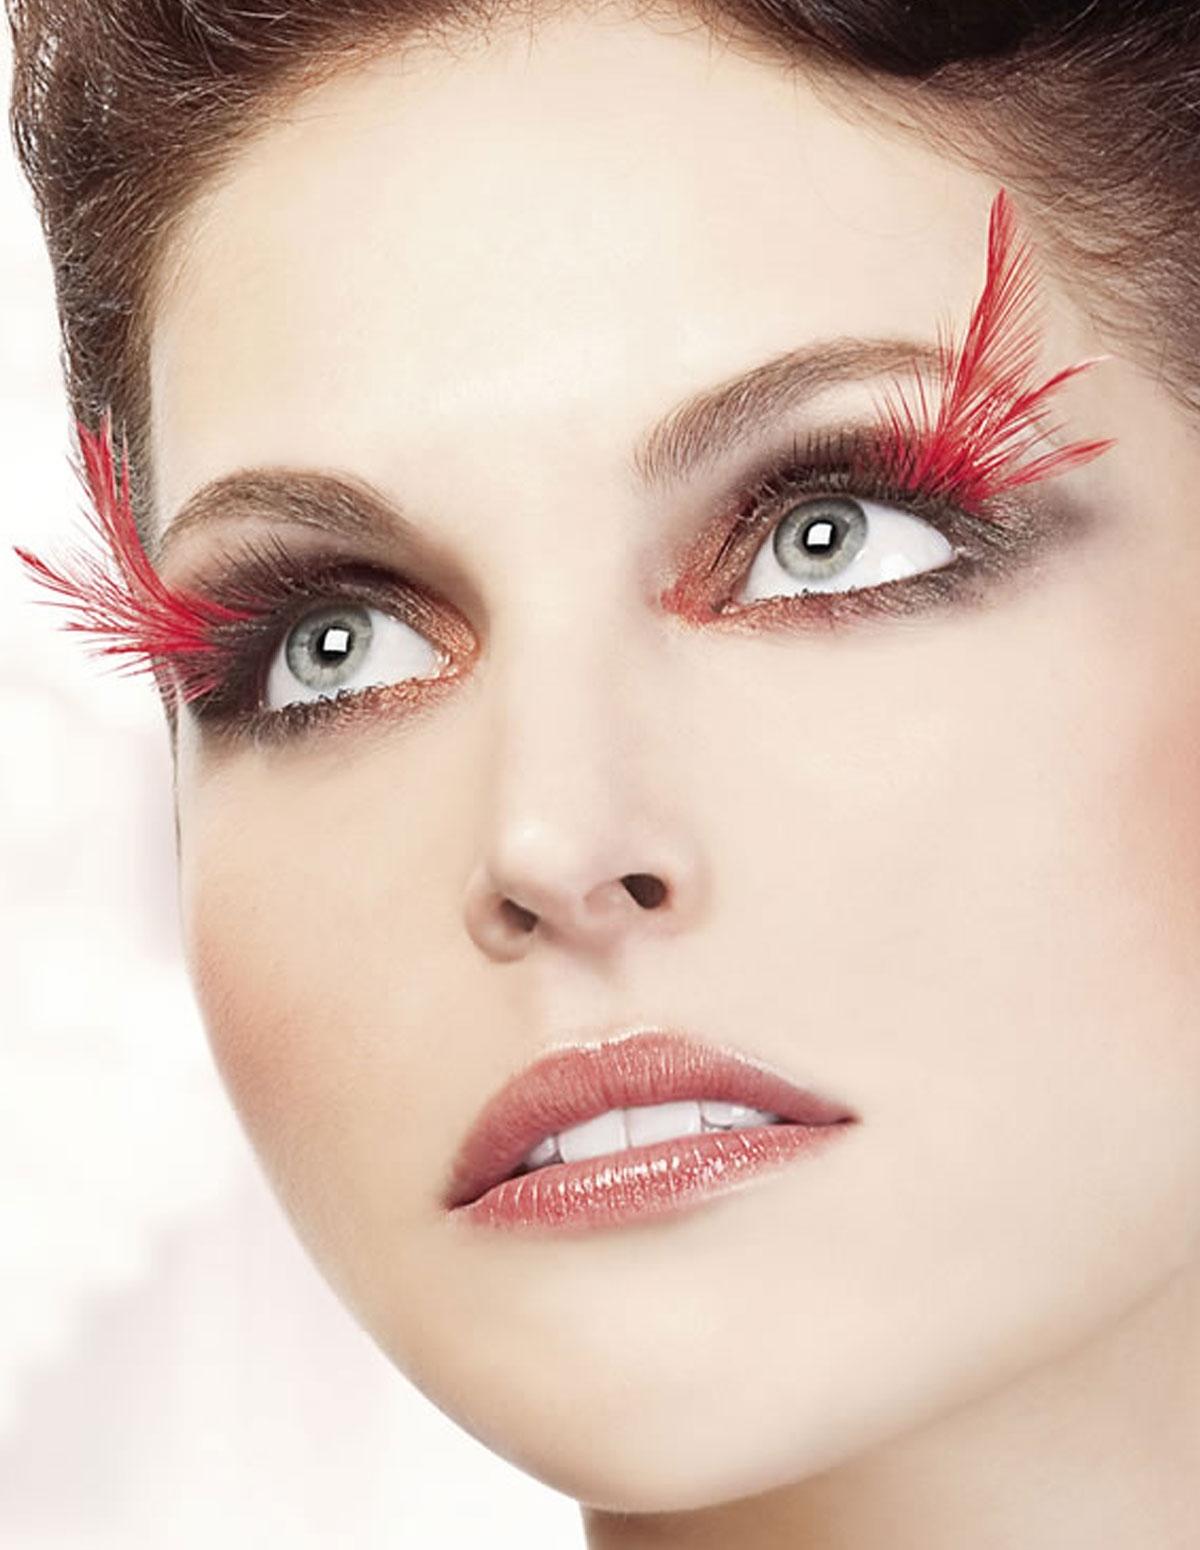 Marnie Eyelashes